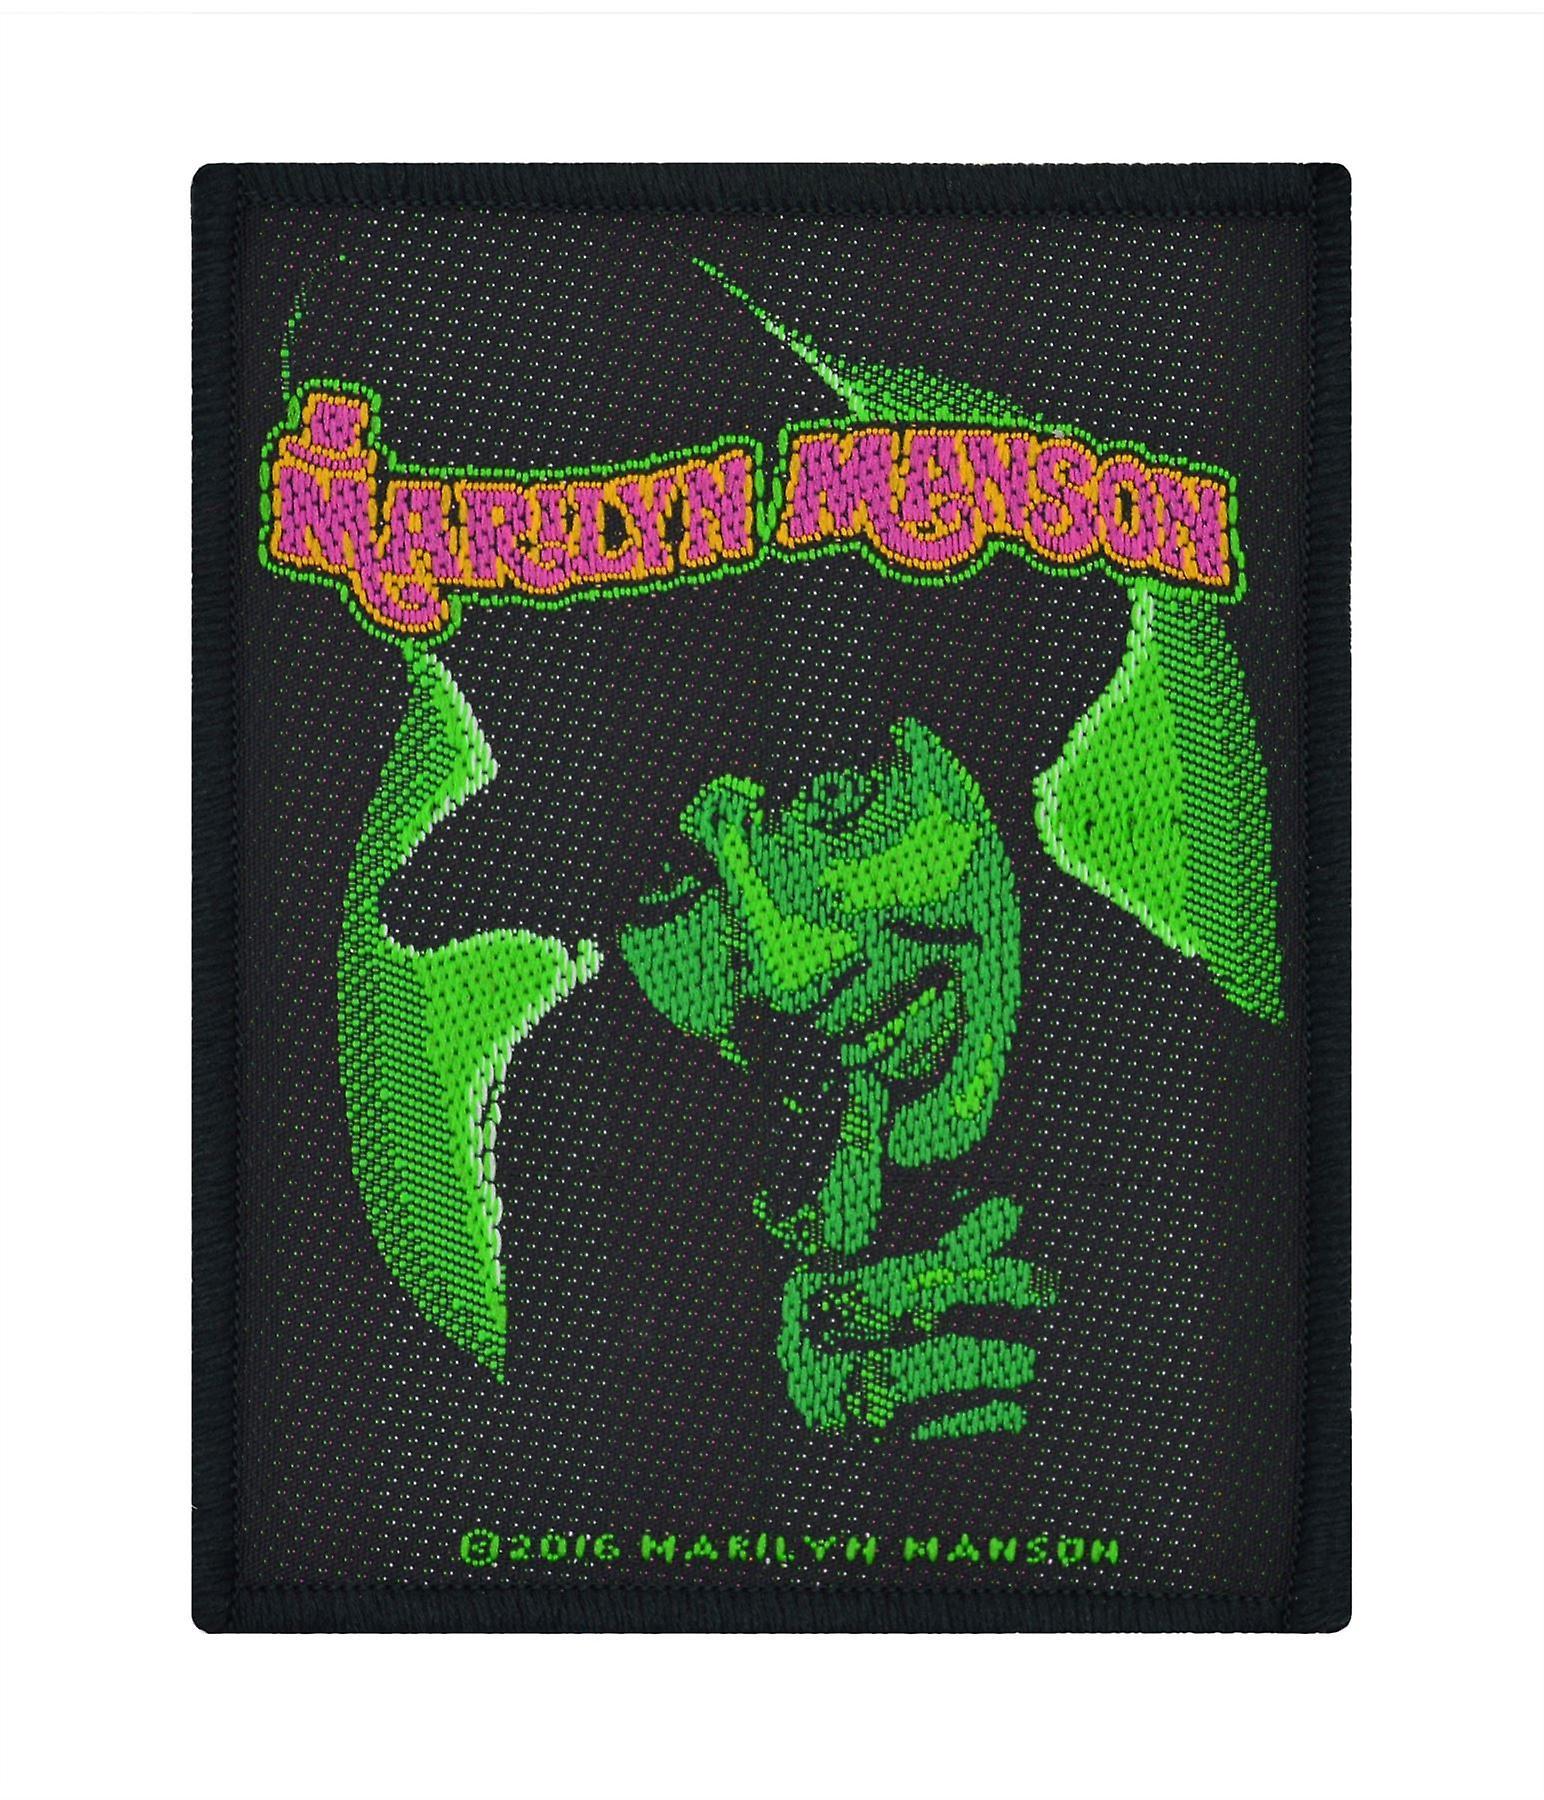 Marilyn Manson Smells Like Children Woven Patch